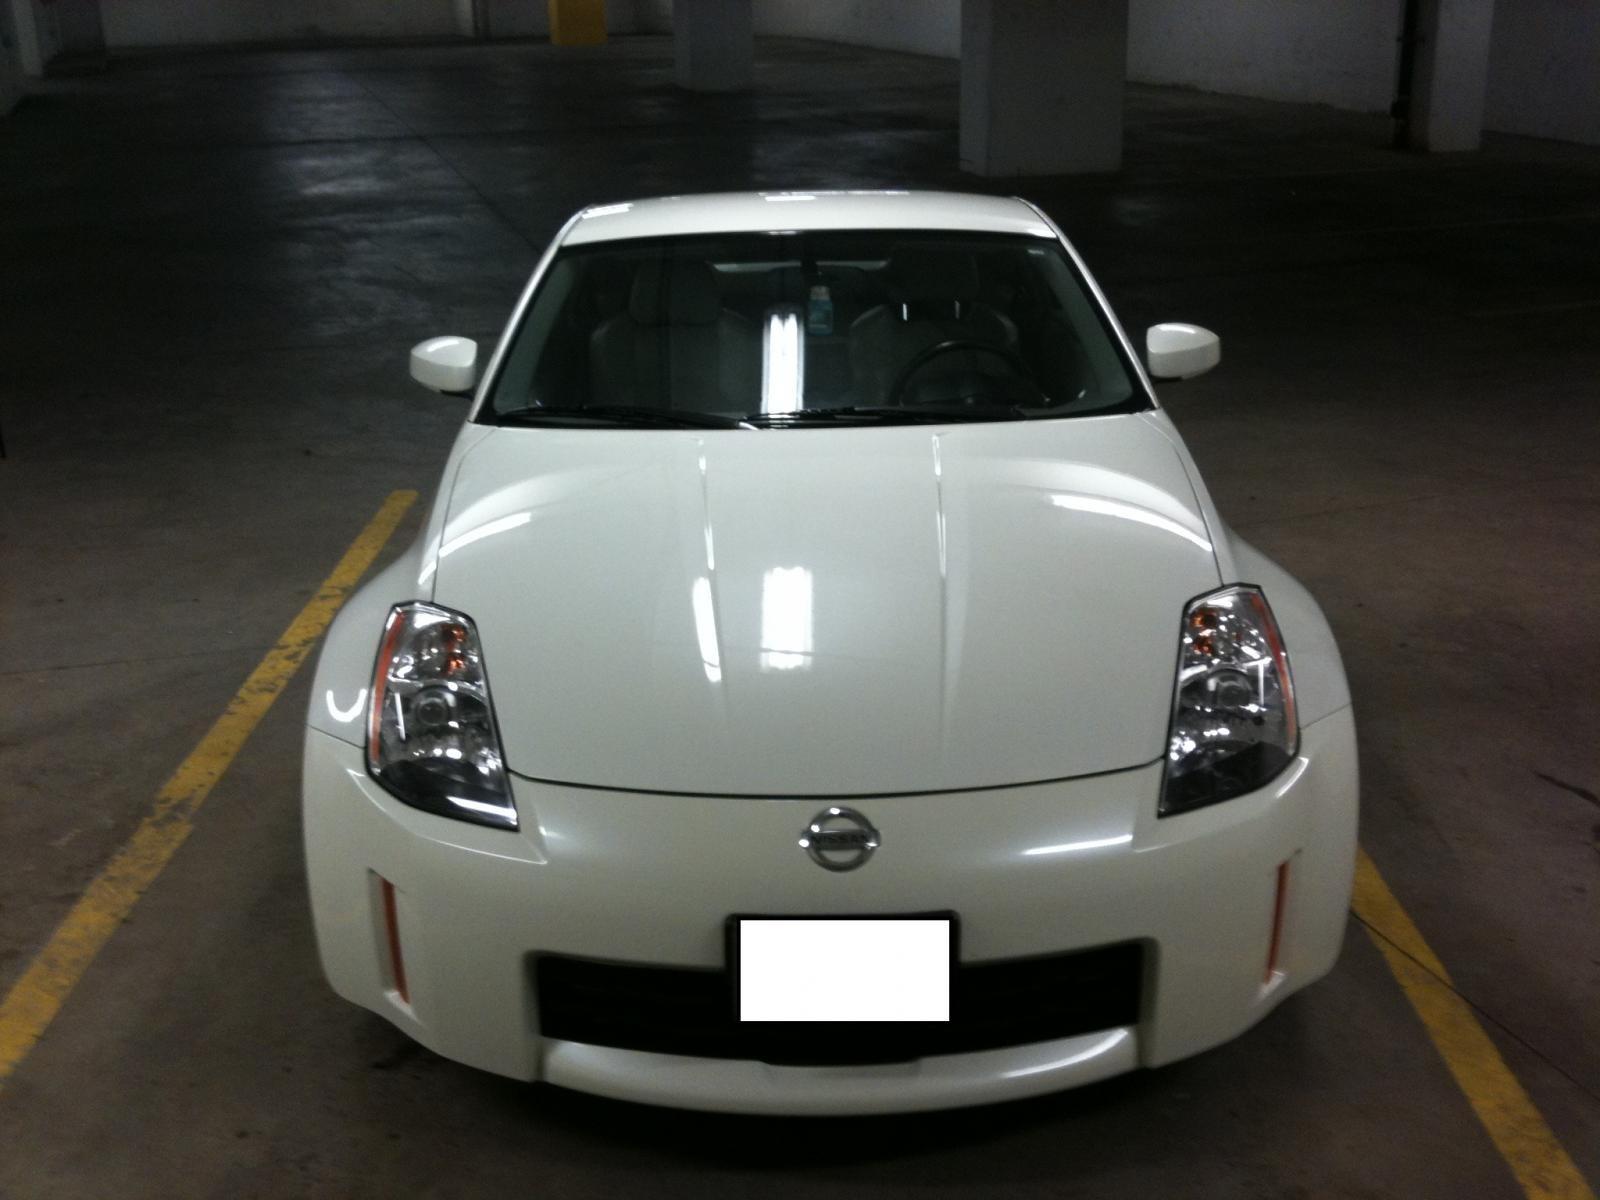 FS: 2004 Nissan 350Z Performance Package (White Pearl)-1.jpg